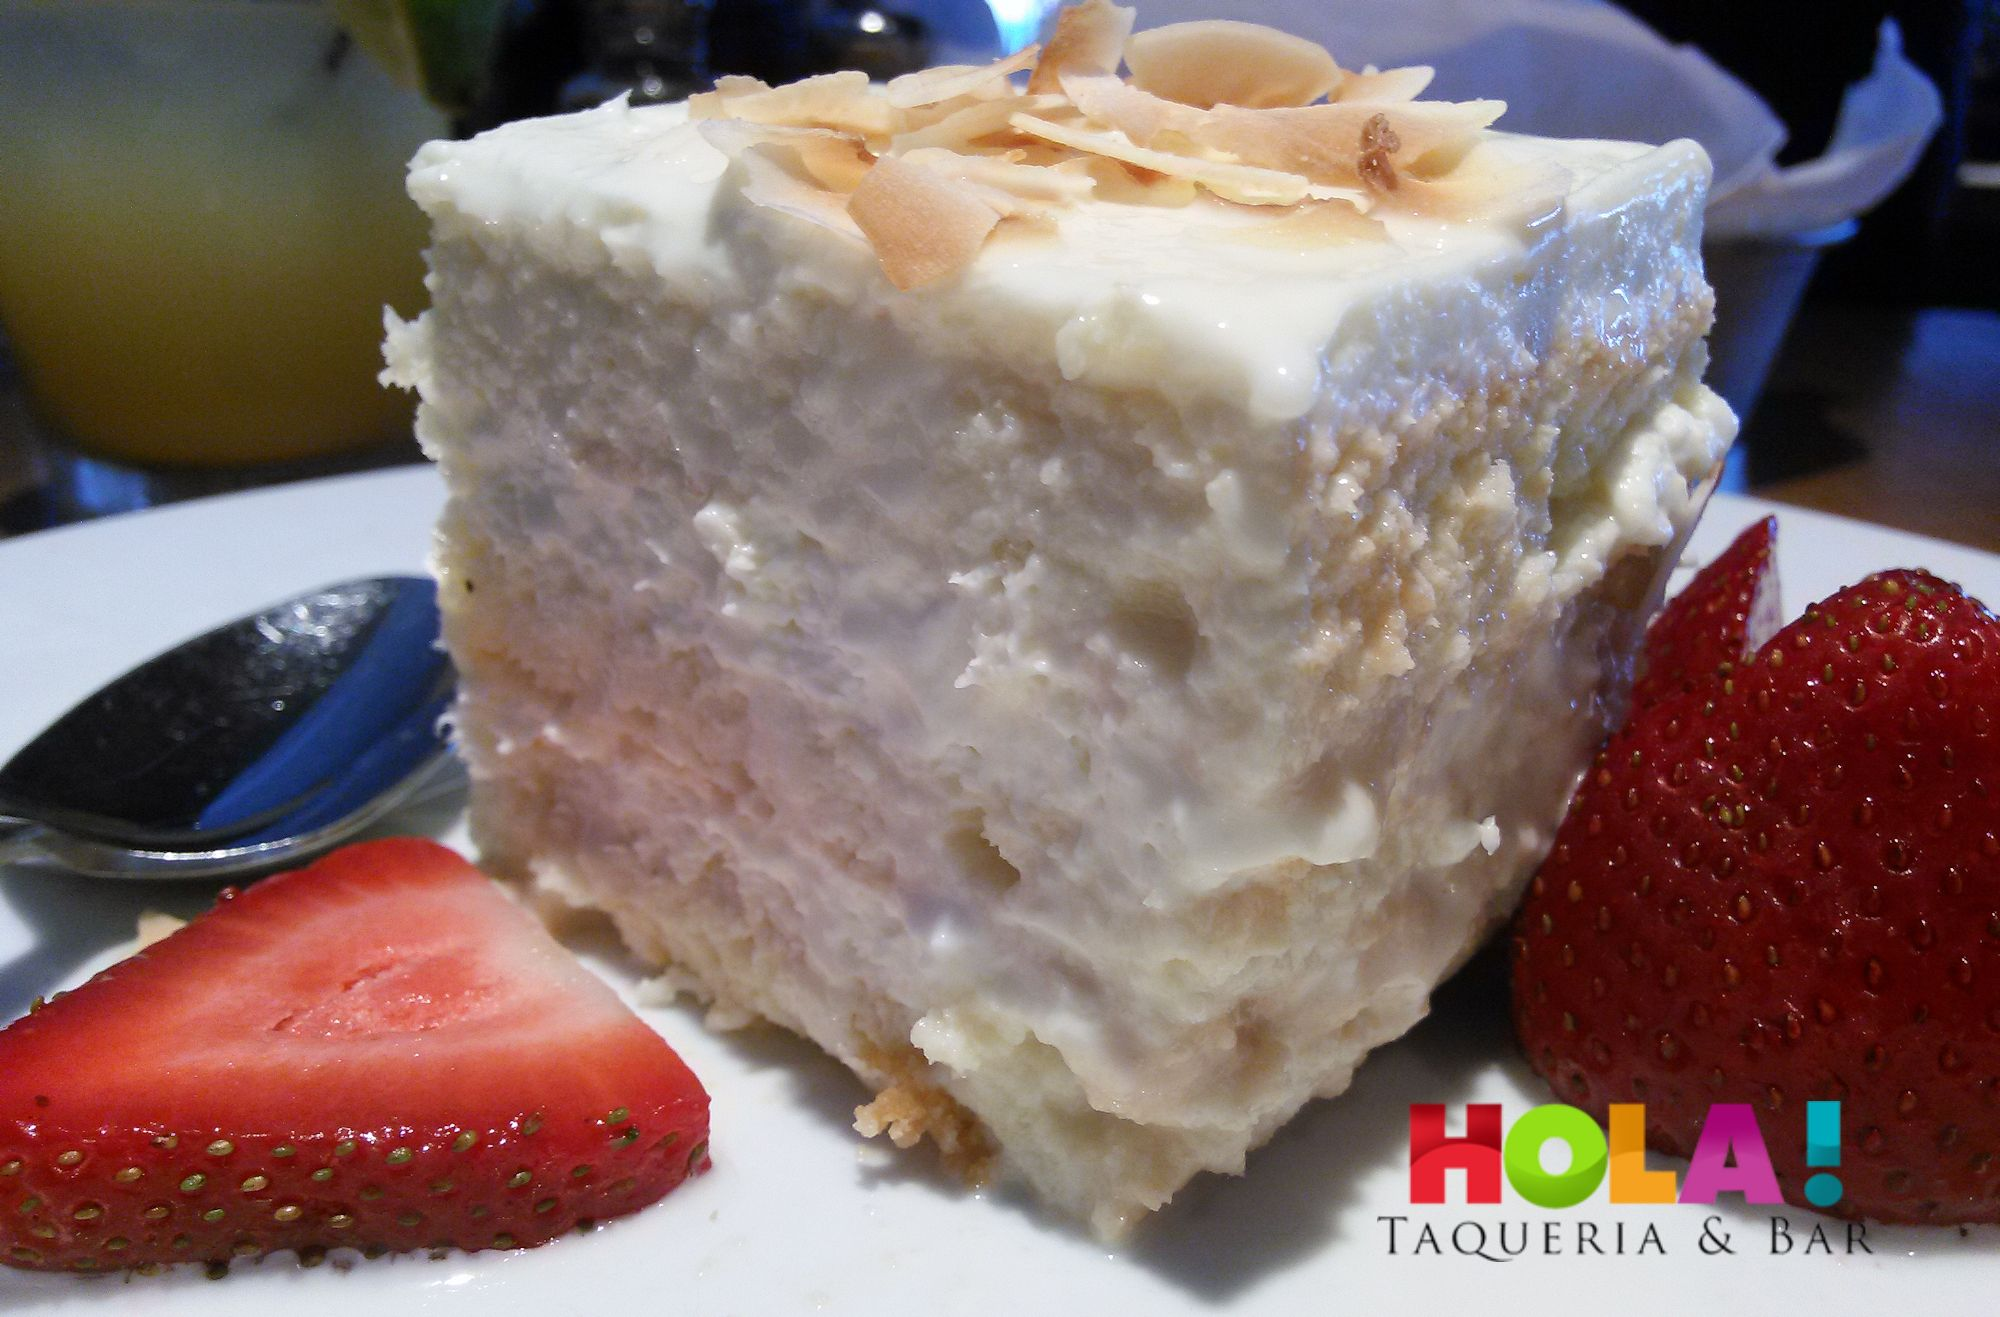 roswell-best-tres-leches-hola-taqueria-bar-atlantalatinos.com